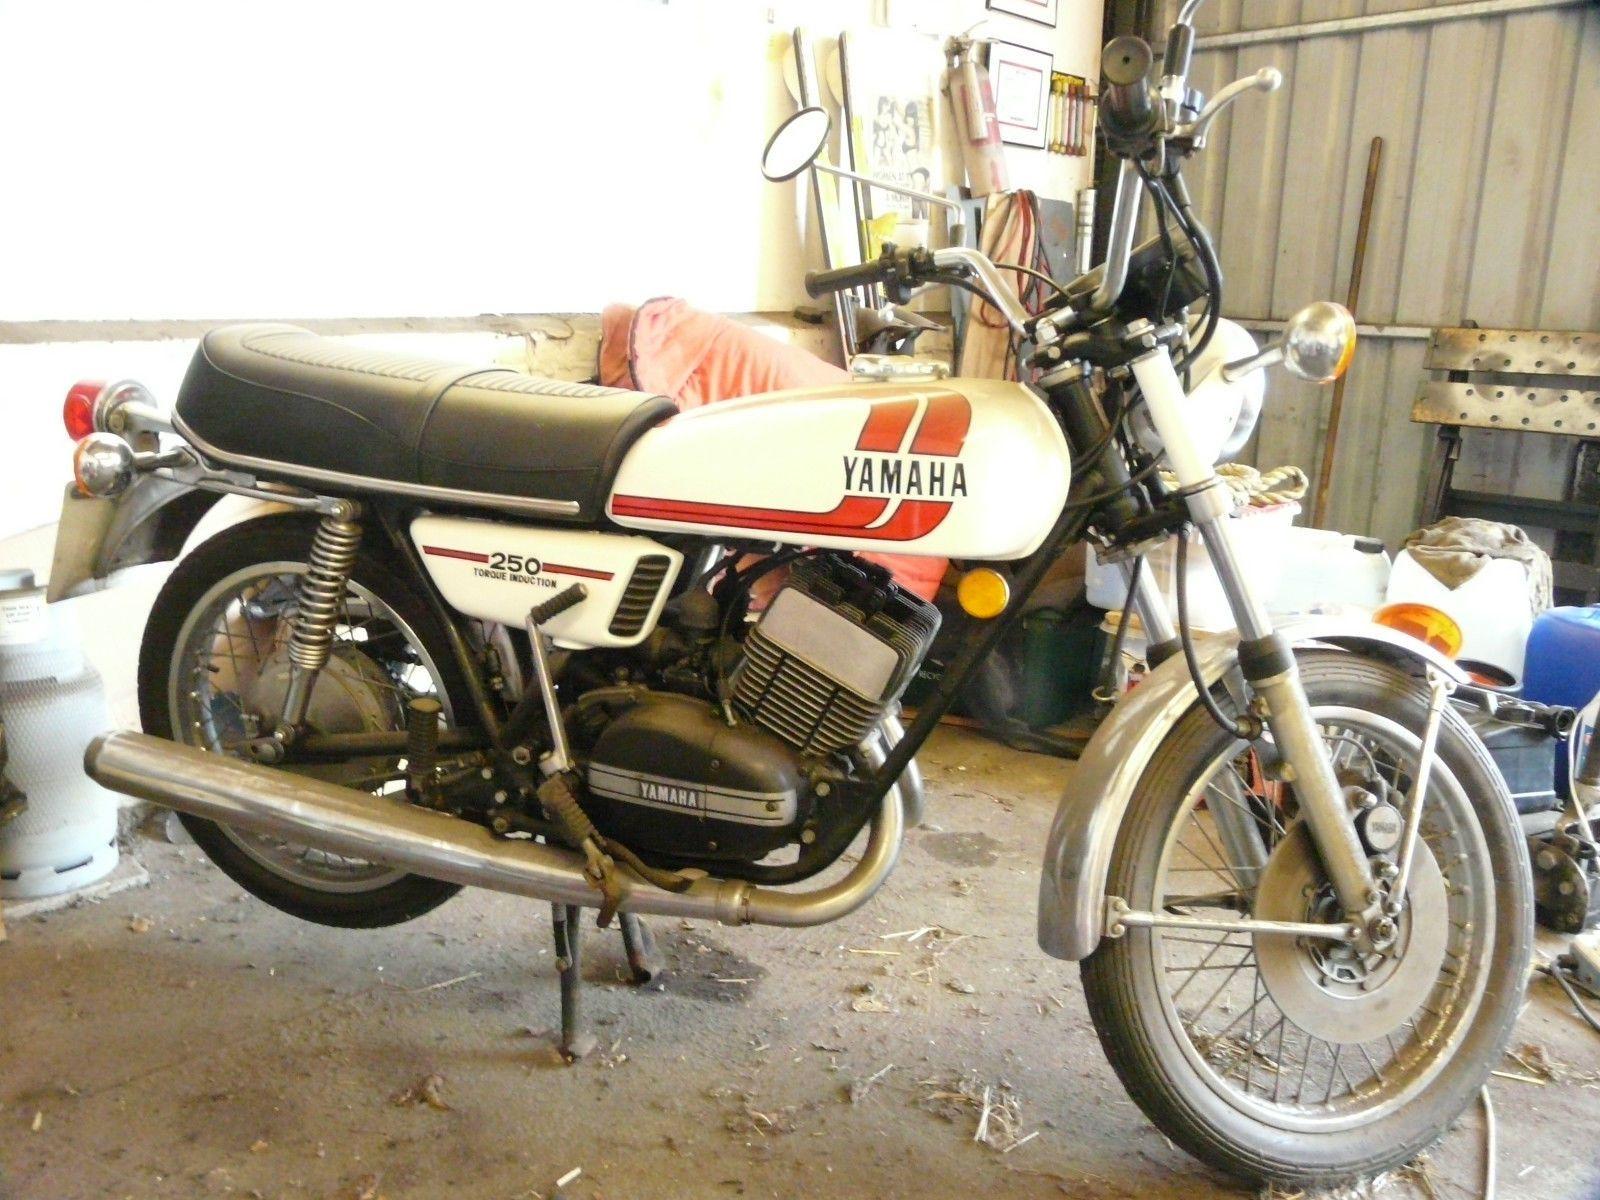 Yamaha rd 250 b | Yamaha RD's | Pinterest | eBay, Classic bikes and Vintage motorcycles